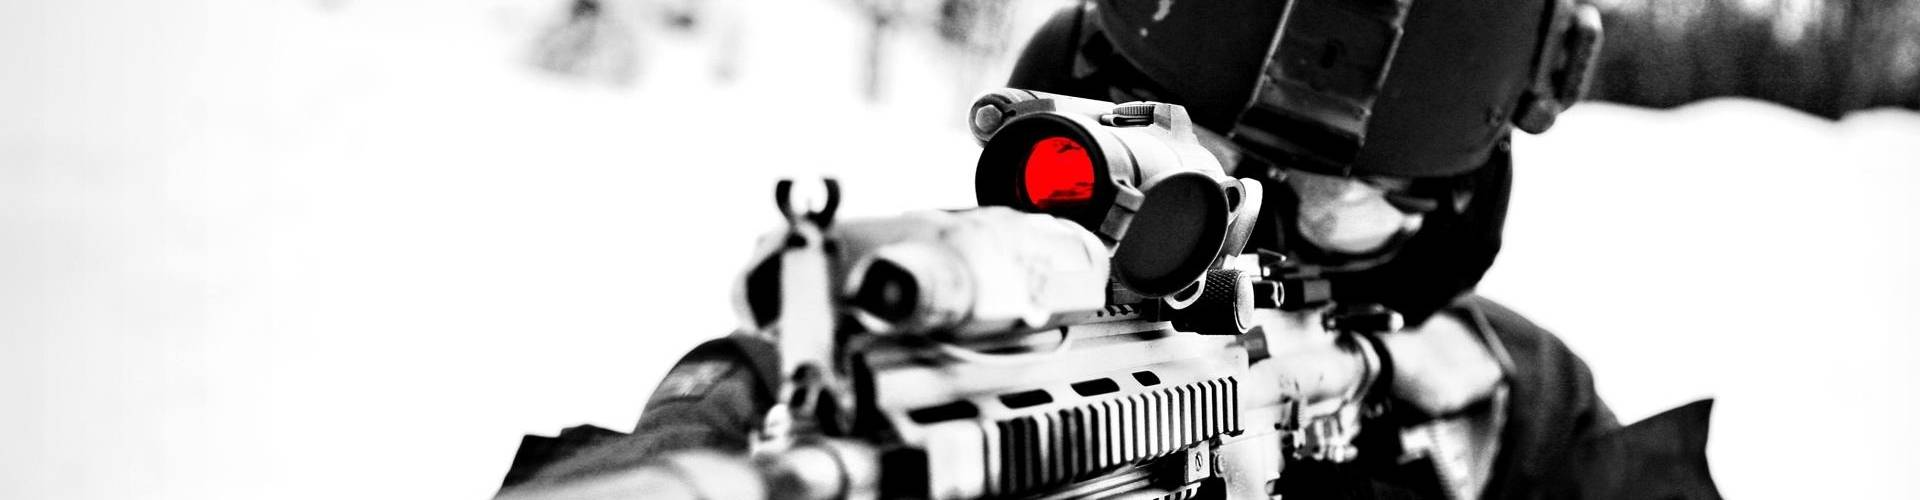 virmuze exhibit Assault Rifles logo main banner